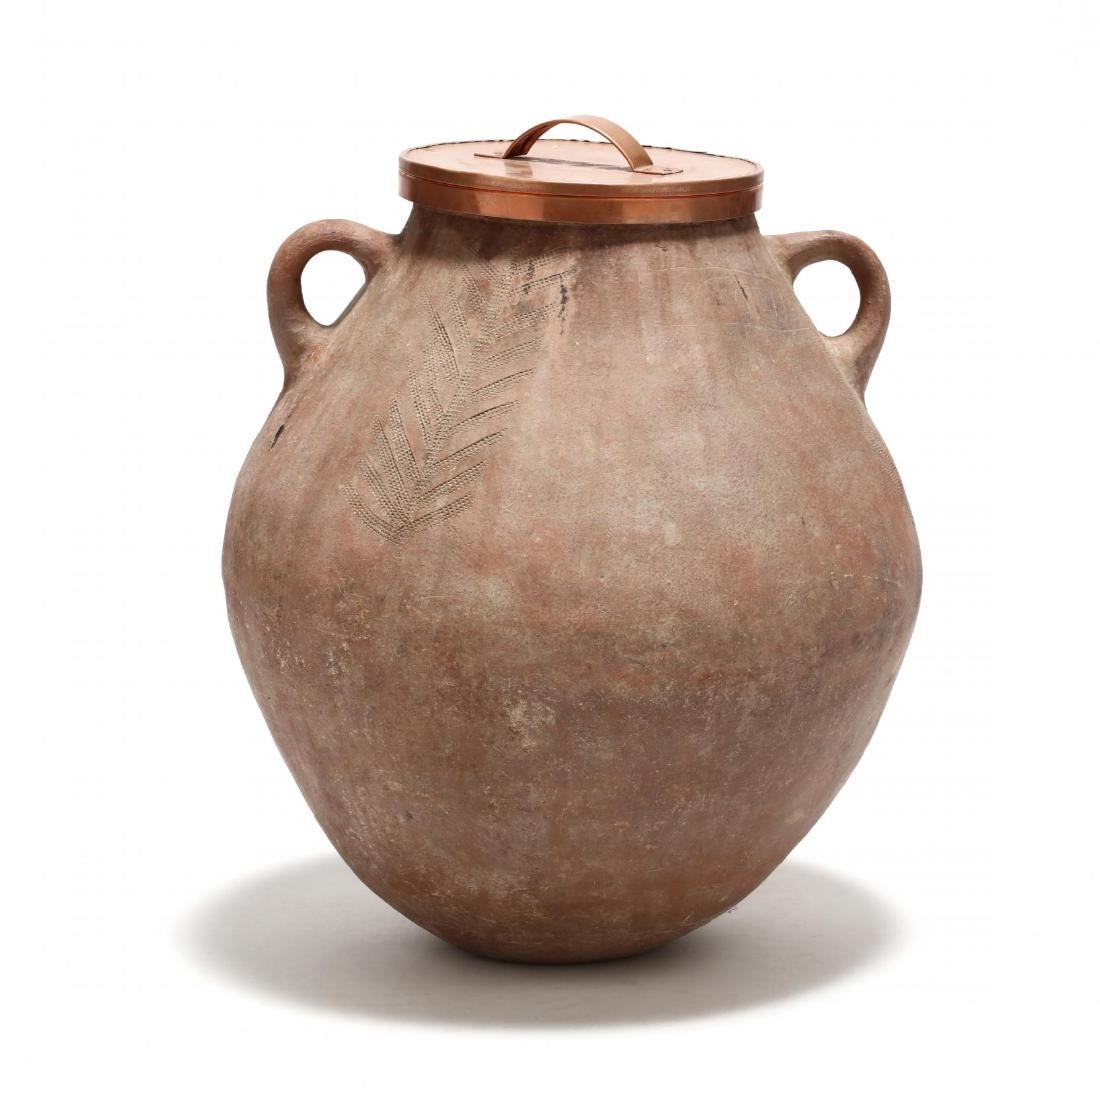 Cypriot Traditional Terracotta Storage Jar